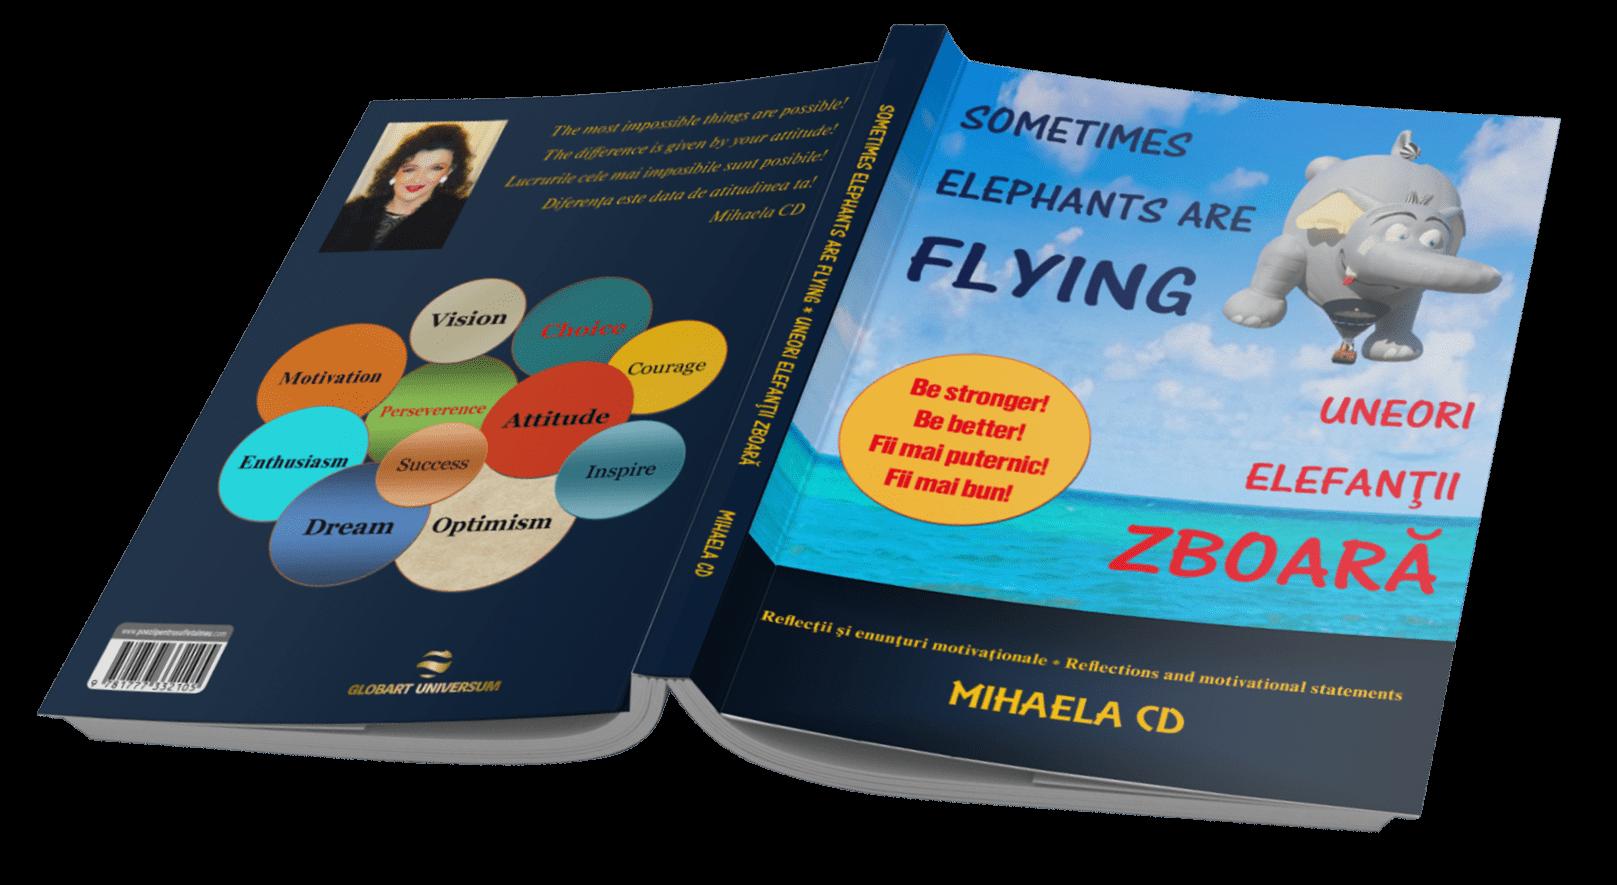 SOMETIMES ELEPHANTS ARE FLYING* MIHAELA CD